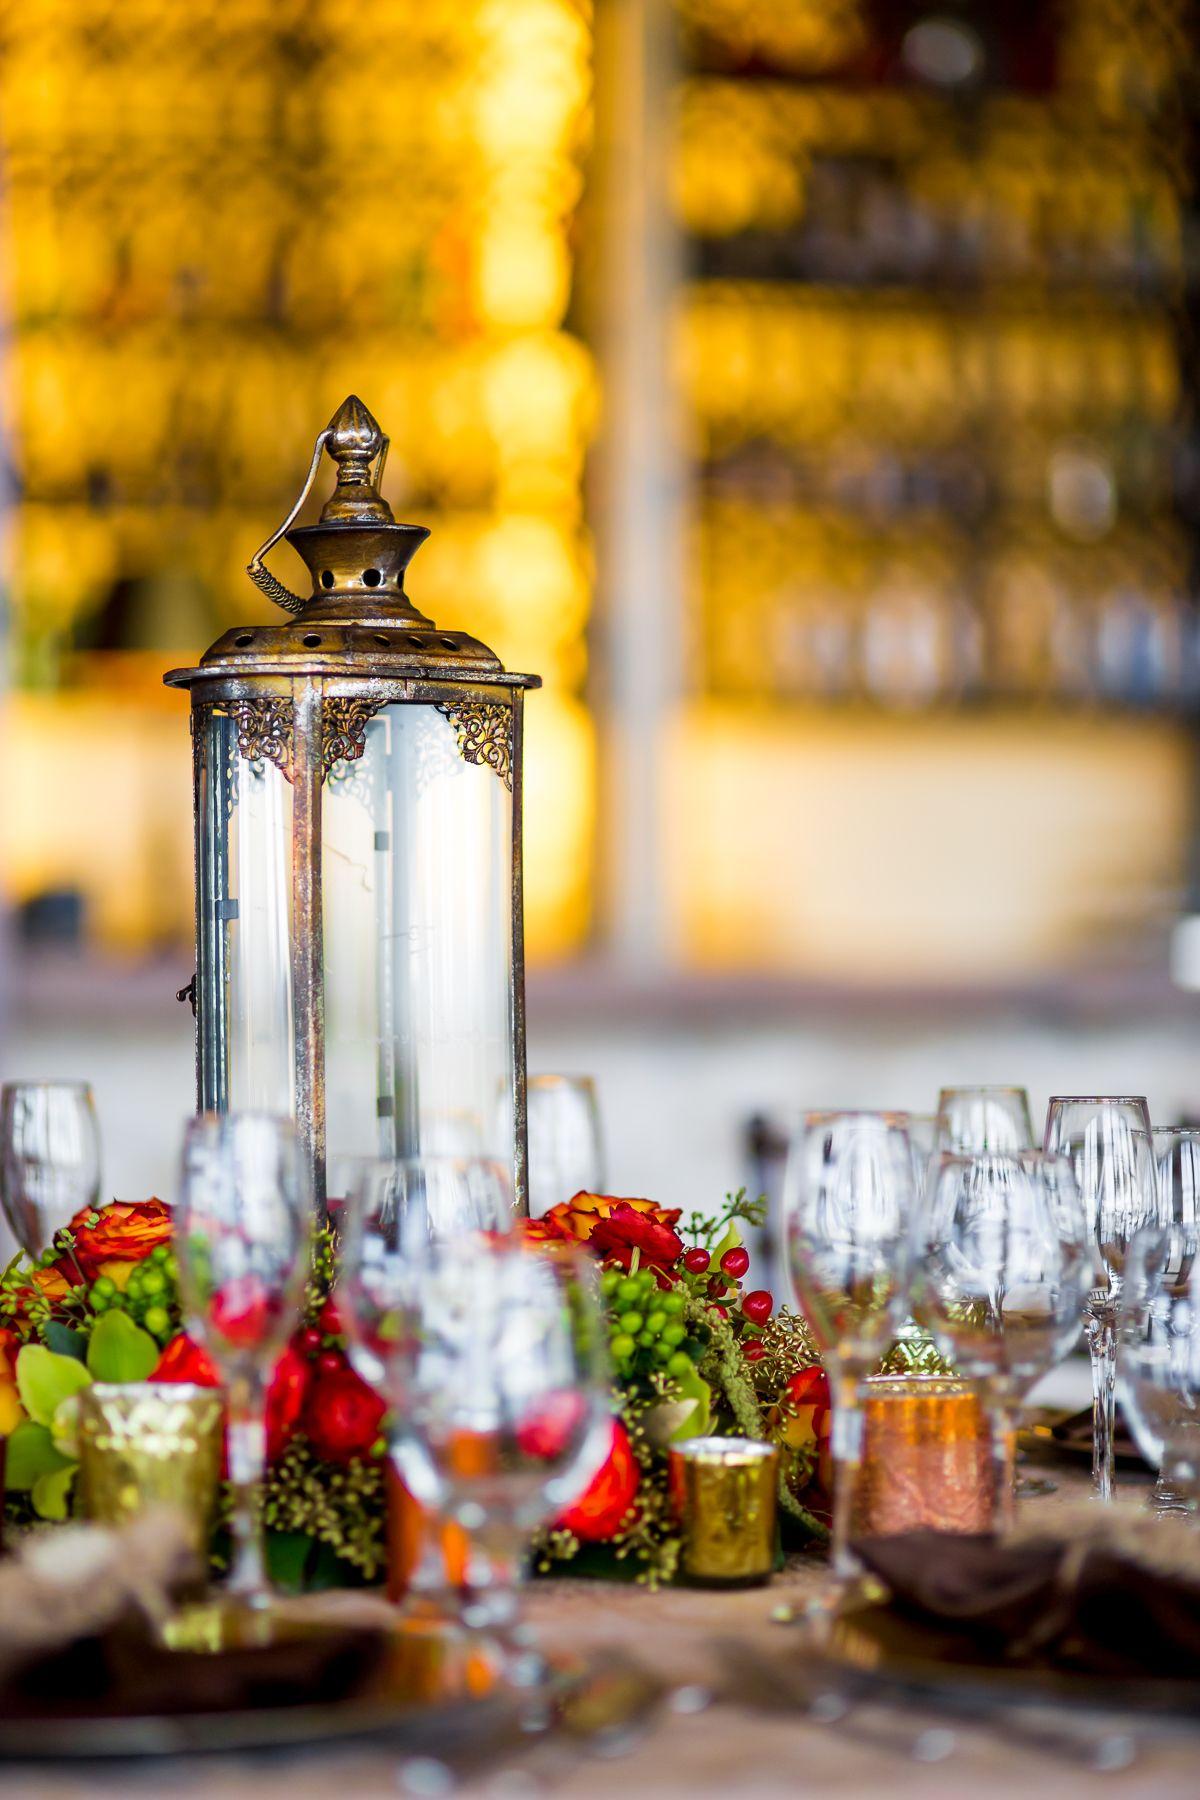 #weddingdecor #coloradosprings #coloradospringswedding #coloradowedding #coloradobride #receptiondecor